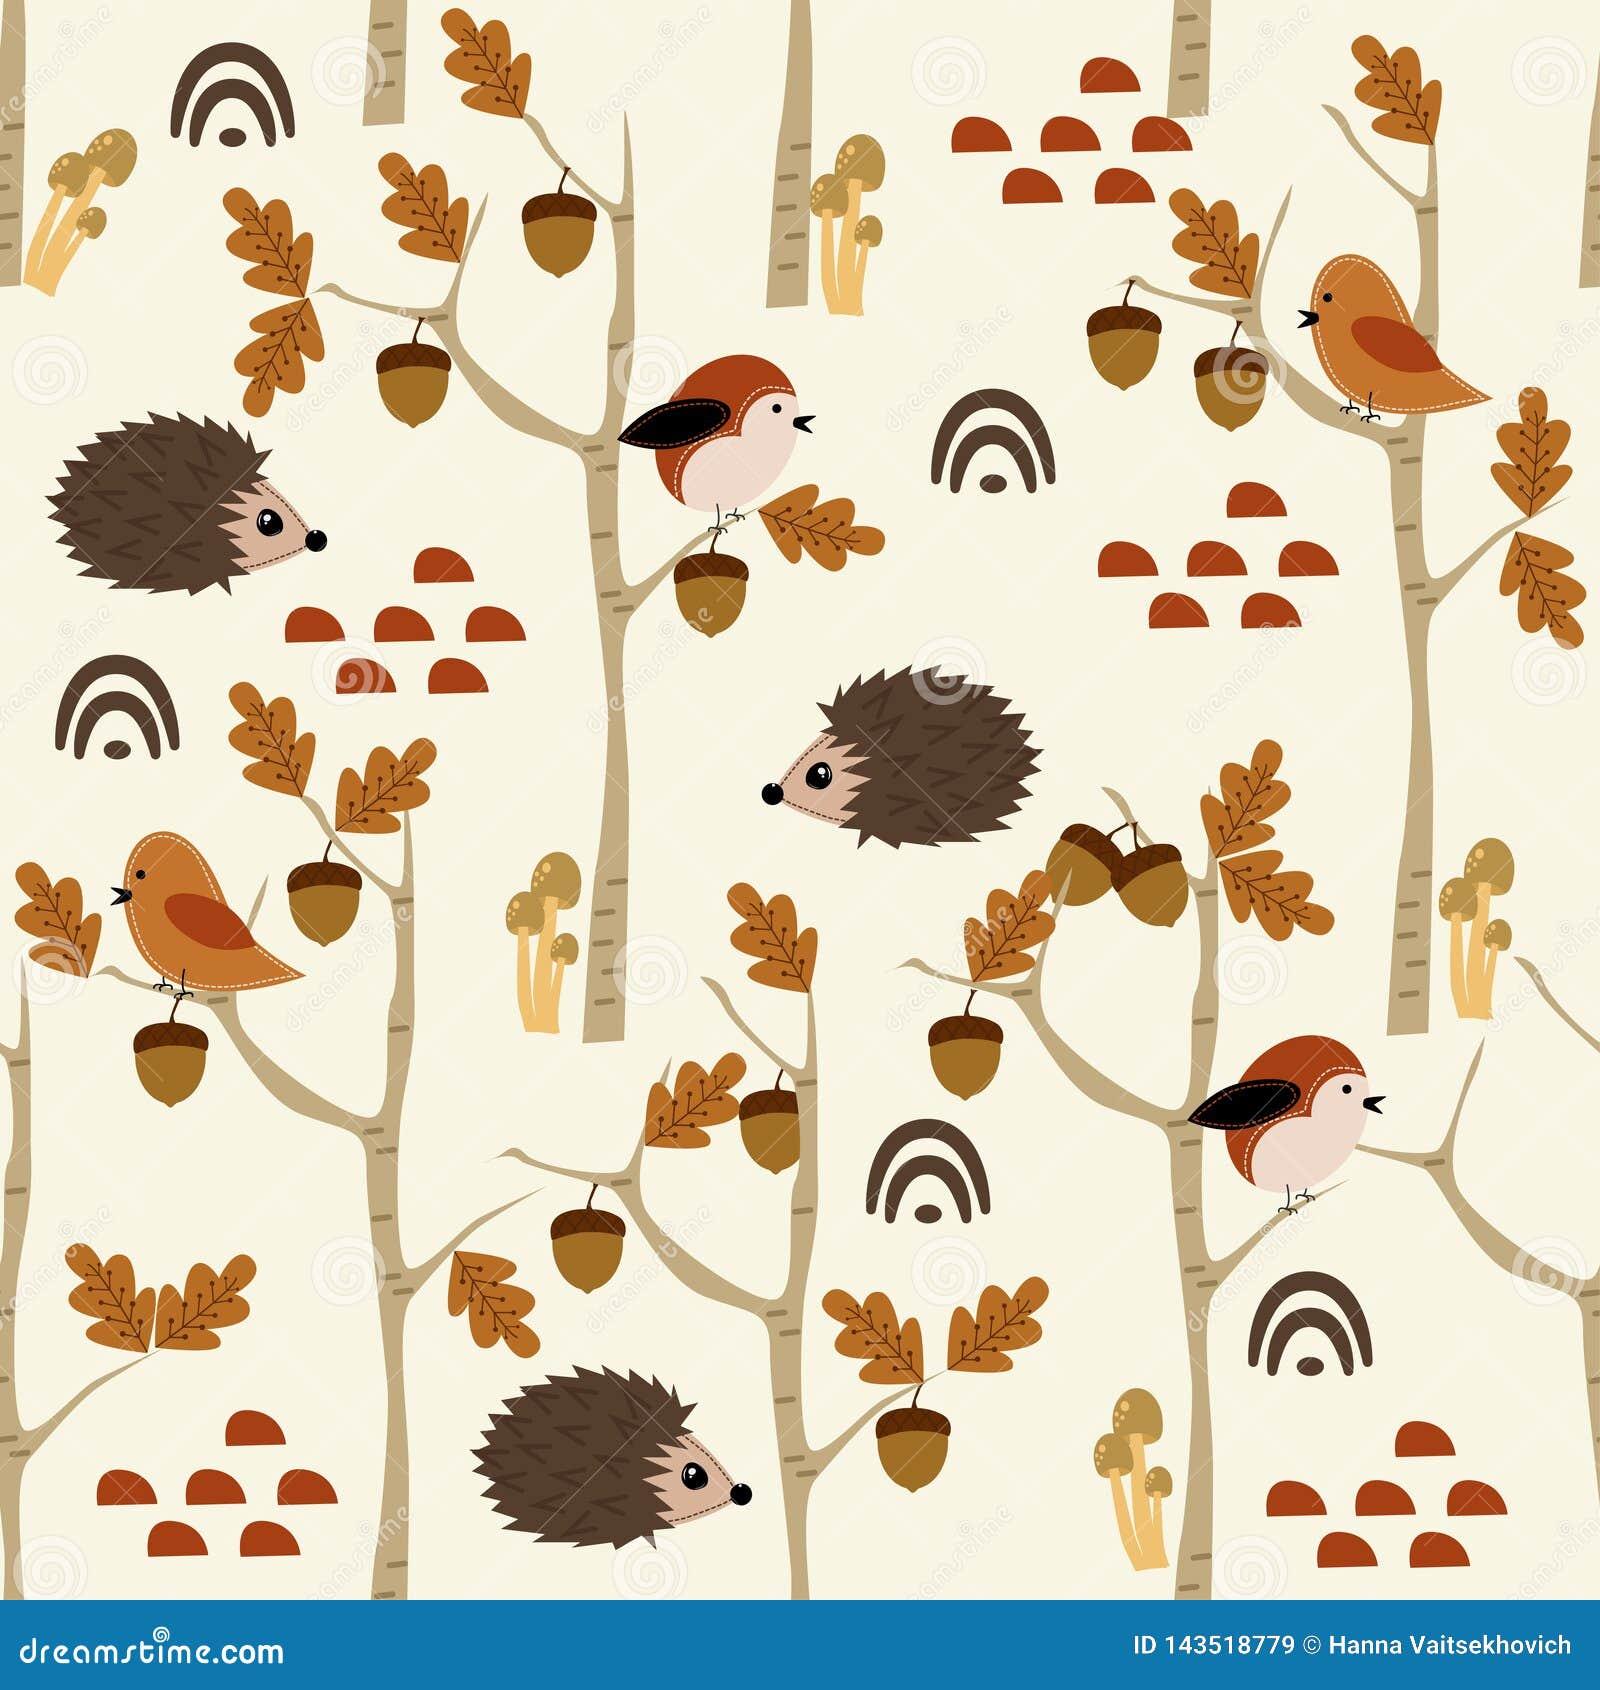 Naadloos patroon met egel en eikel in bos - vectorillustratie, eps